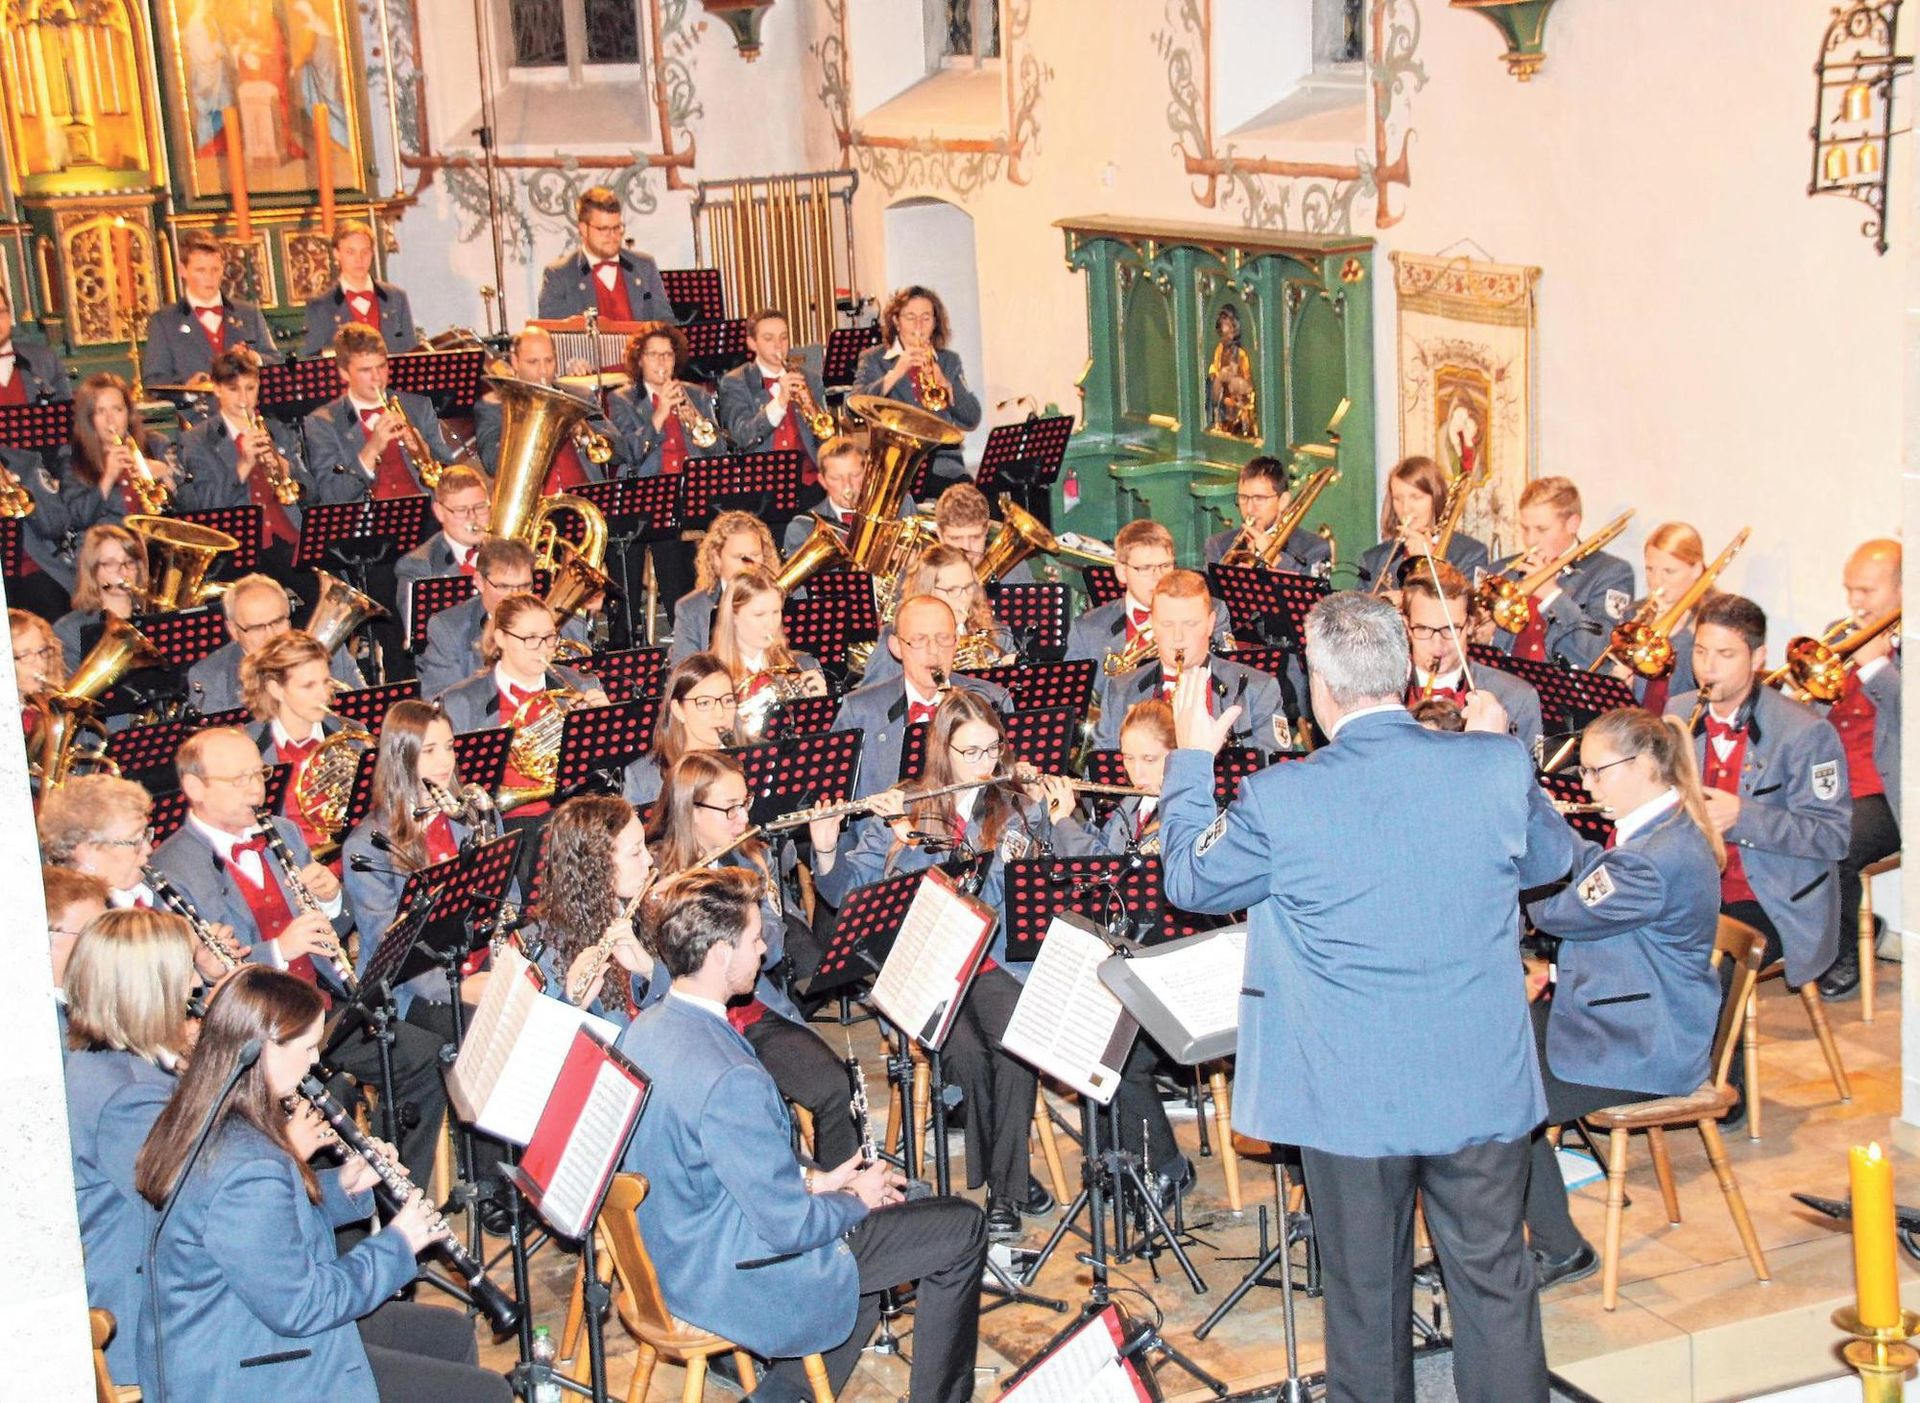 Musiker in der Pfarrkirche Mariä Himmelfahrt in Allmendingen